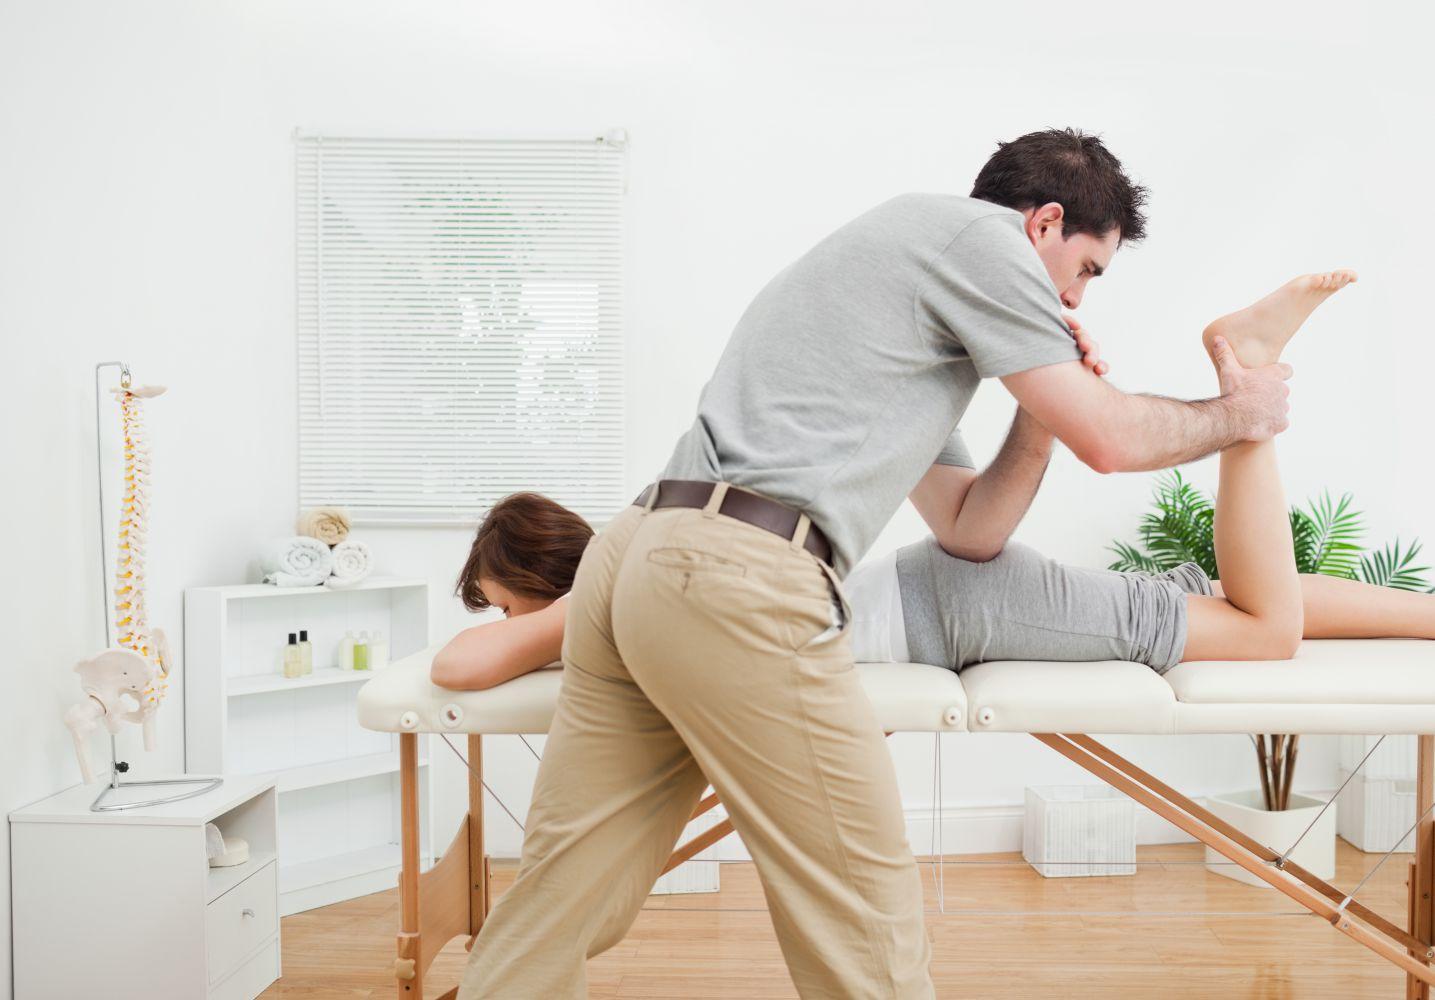 Chiropractors working in Thomasville, NC